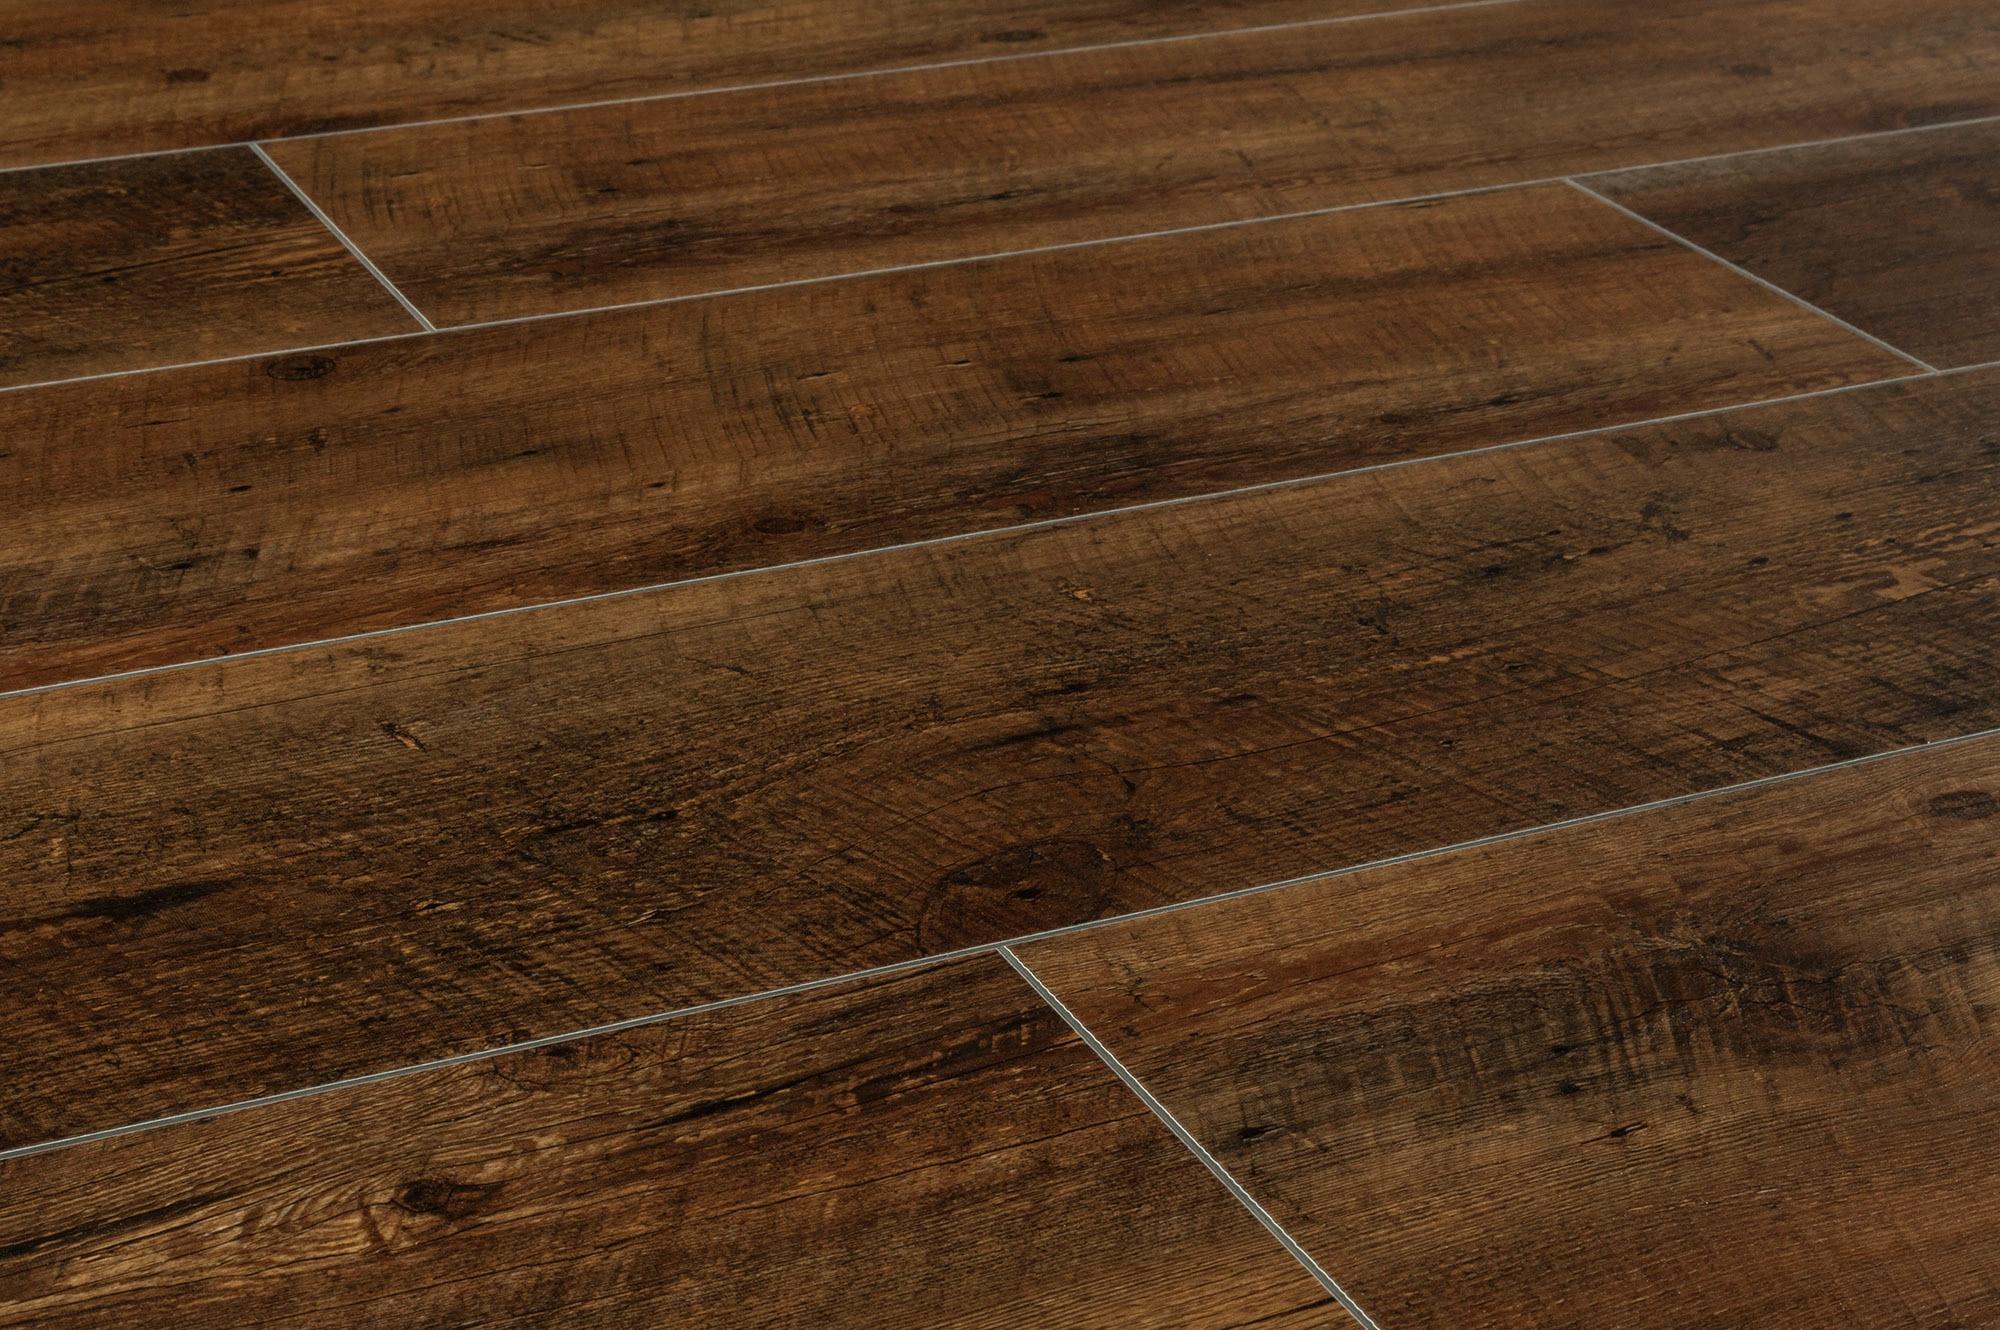 Vesdura Vinyl Planks Hdf Click Lock Country Wide Collection Zurich Rustic Walnut